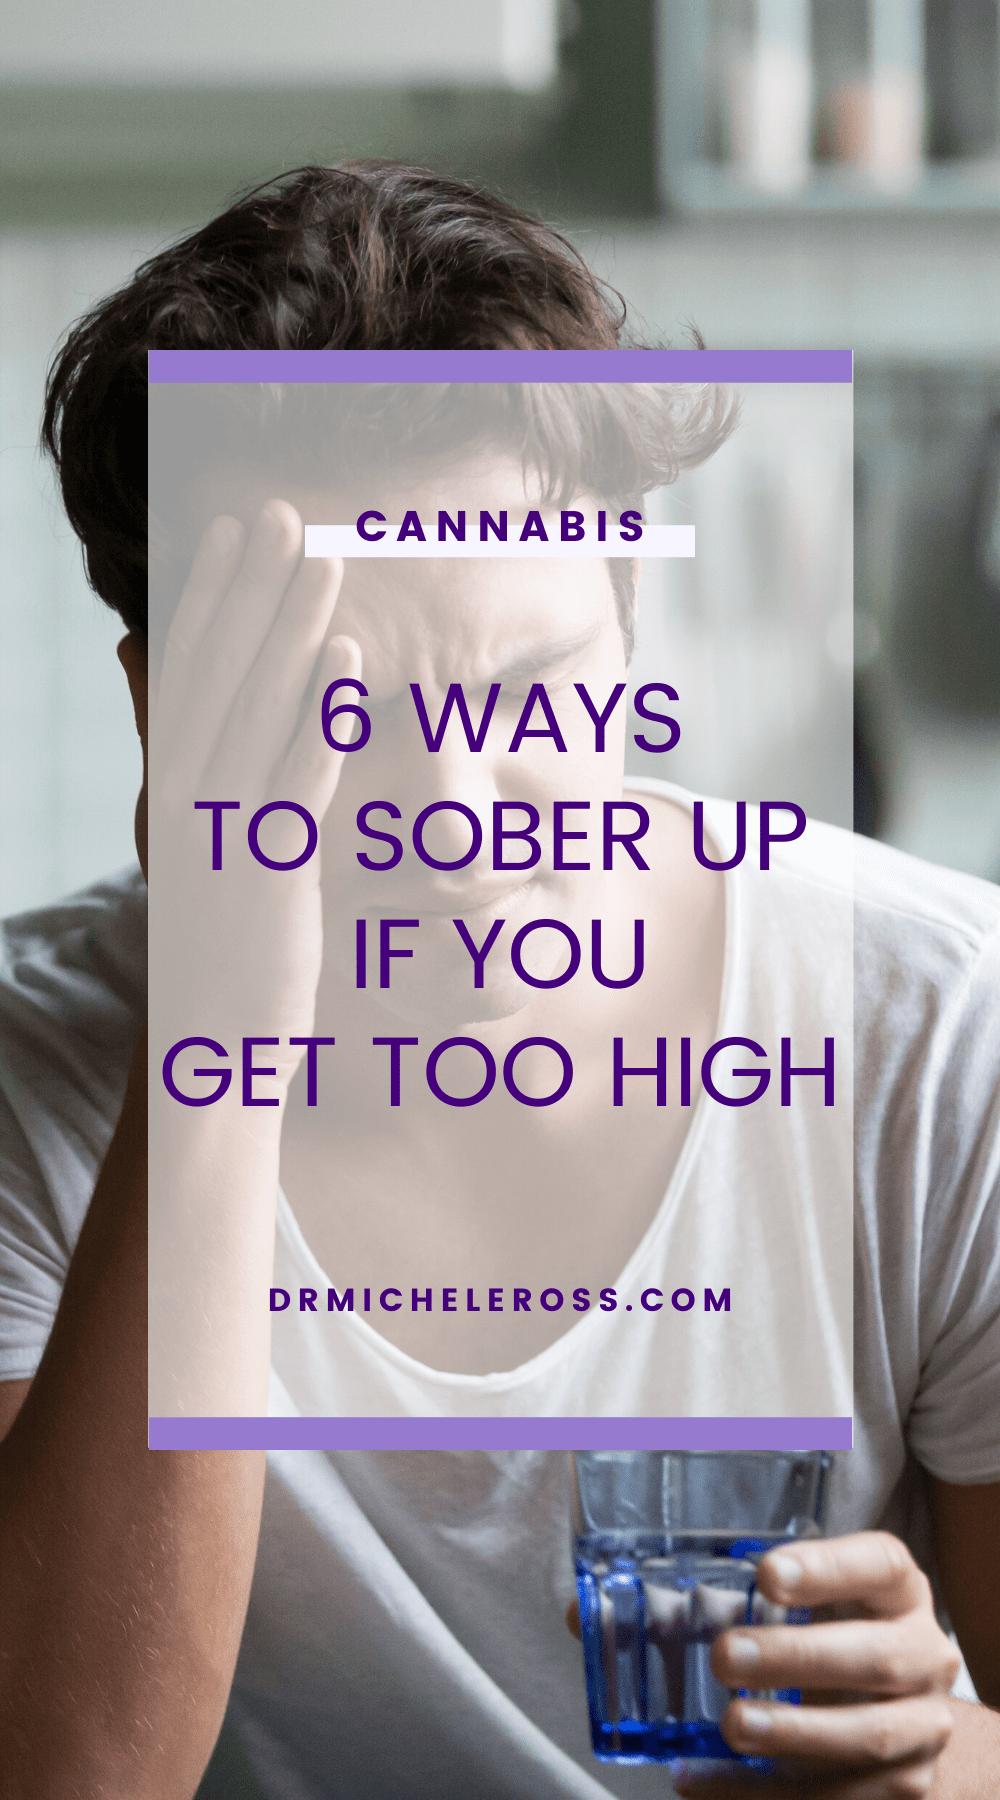 6 Ways To Sober Up If You Get Too High